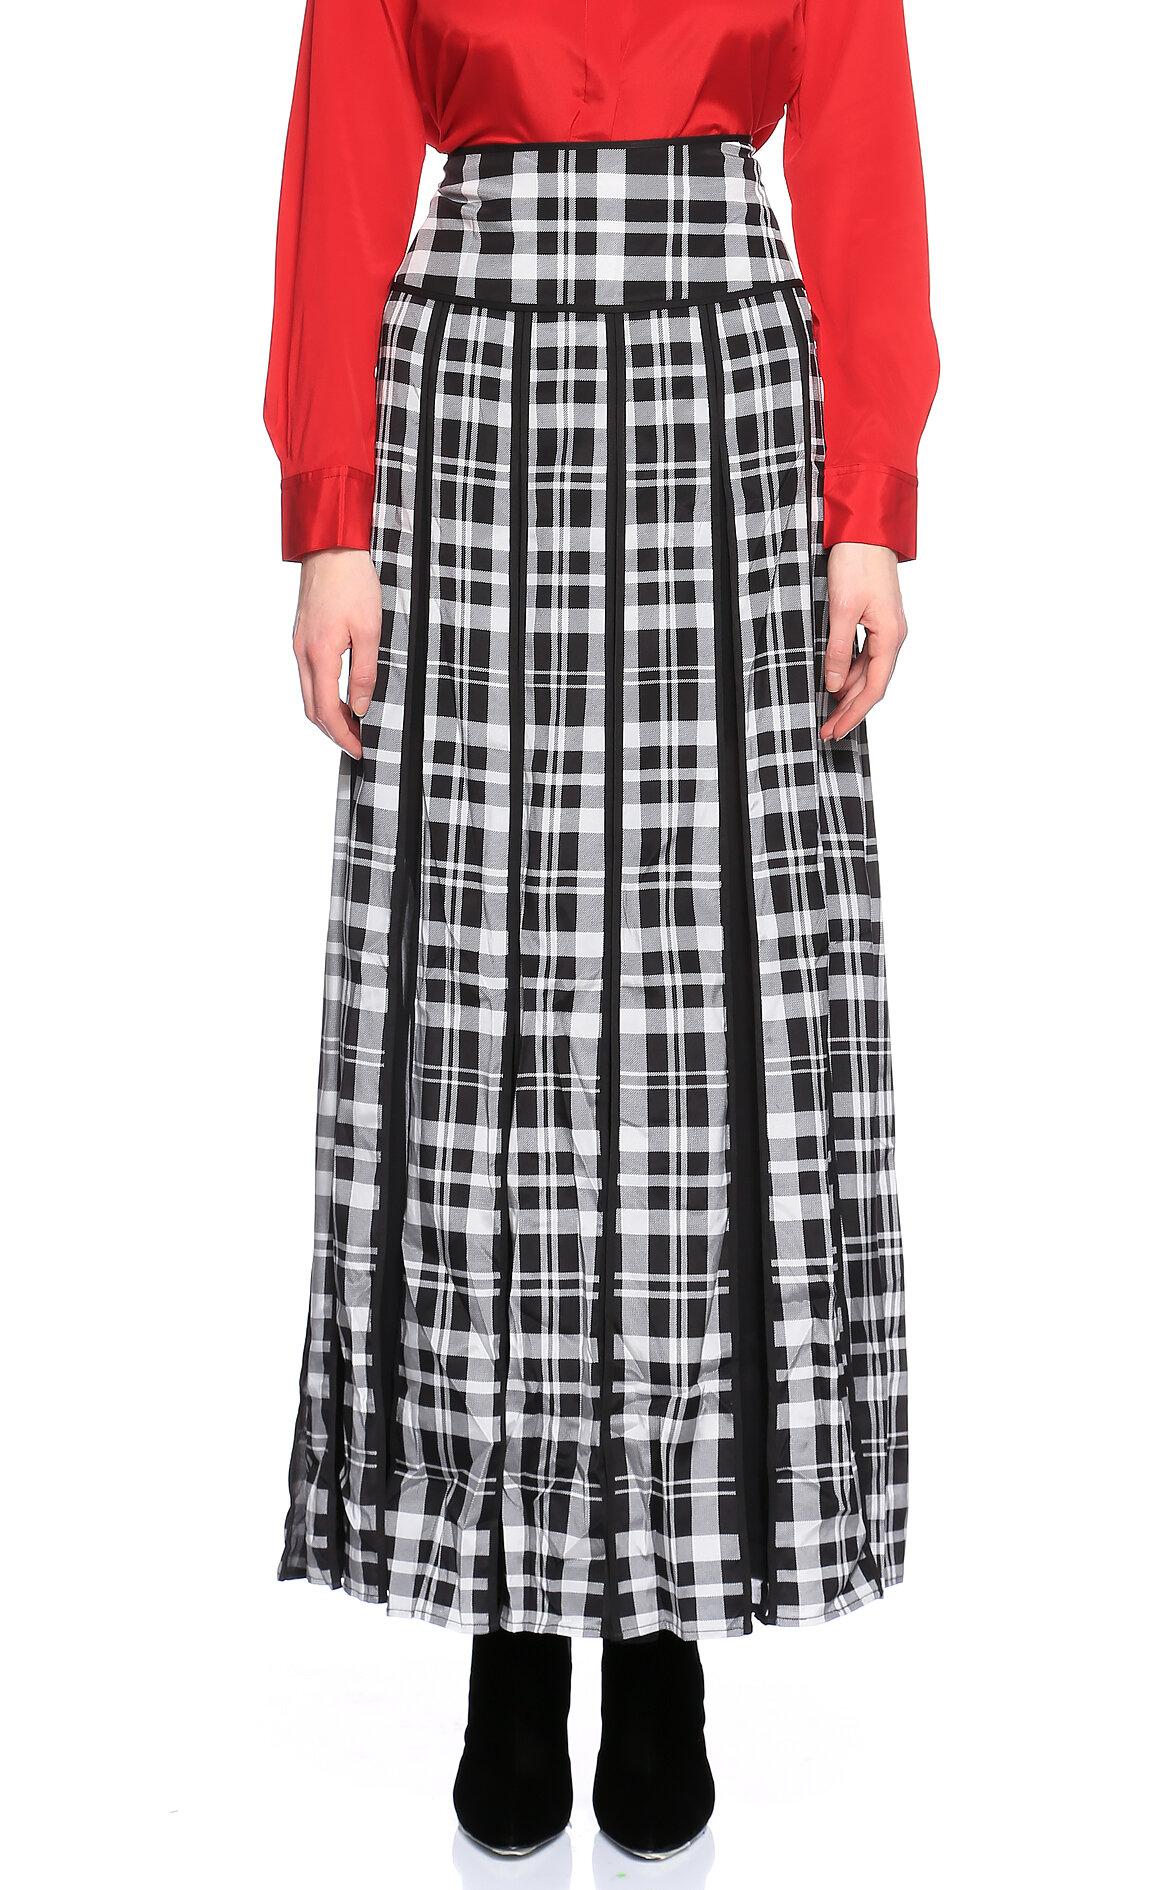 DKNY-DKNY Kareli Siyah-Beyaz Uzun Etek